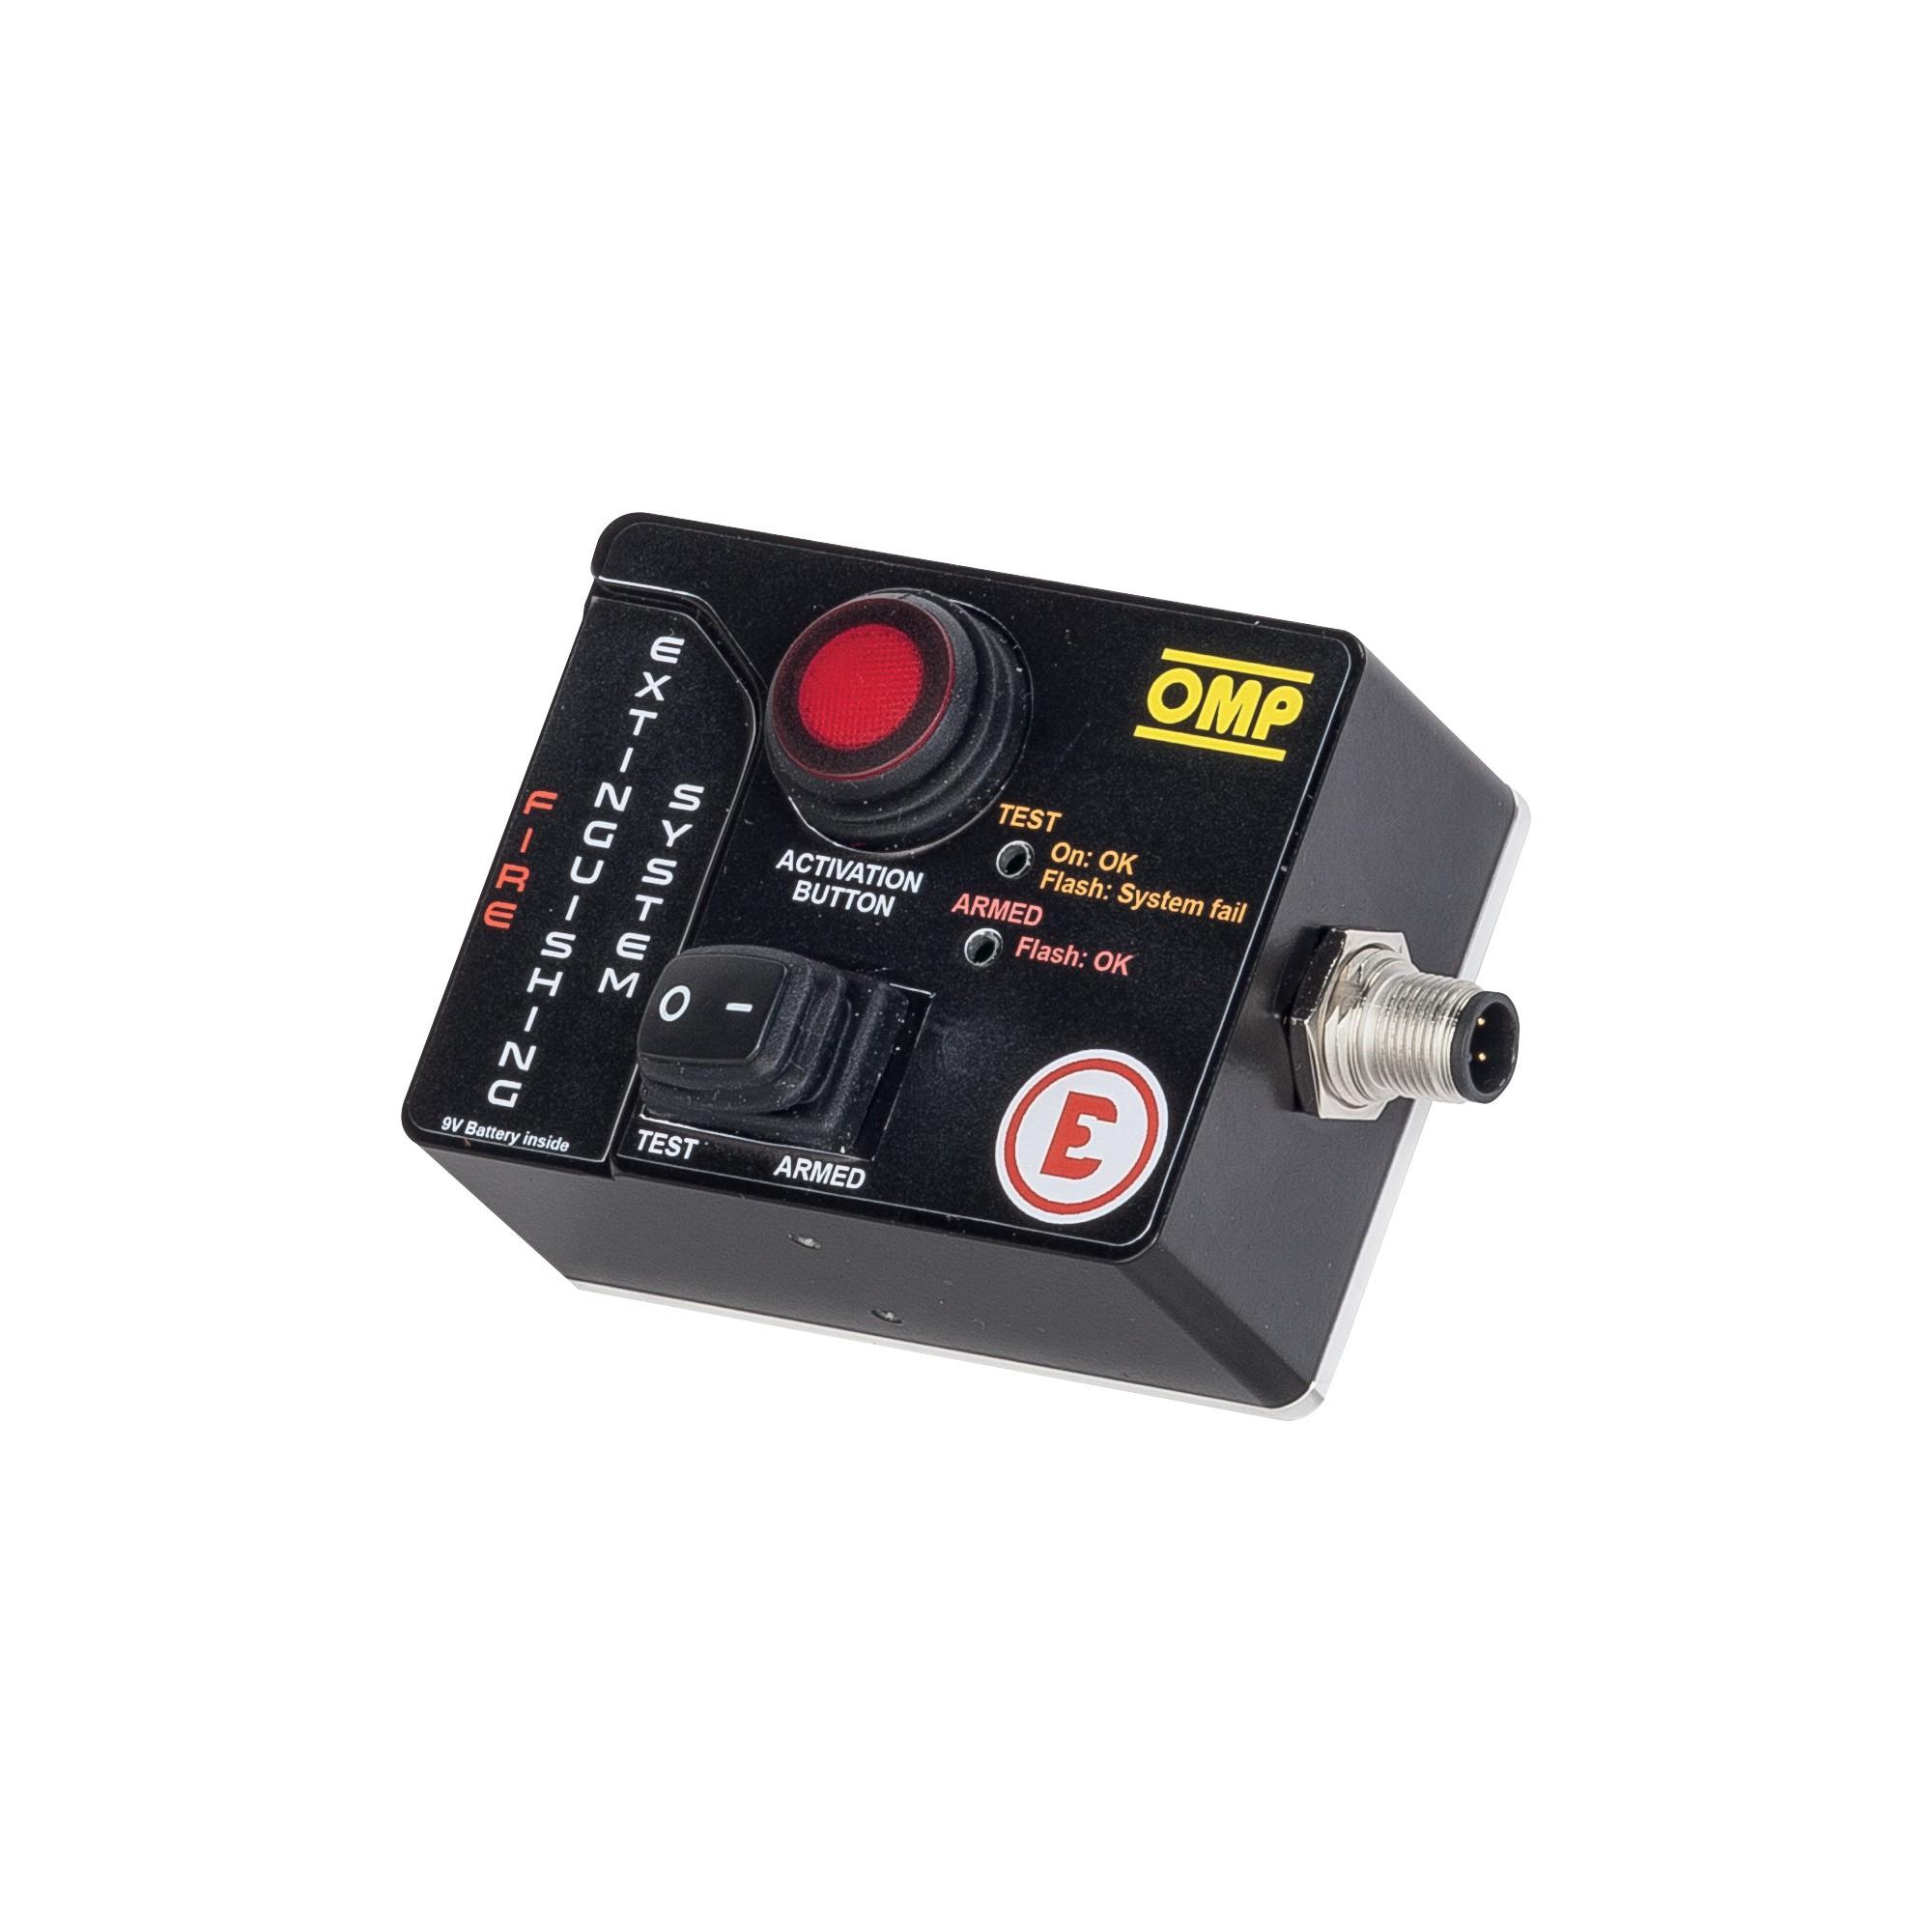 Extinguisher control box - EXTINGUISHER CONTROL BOX